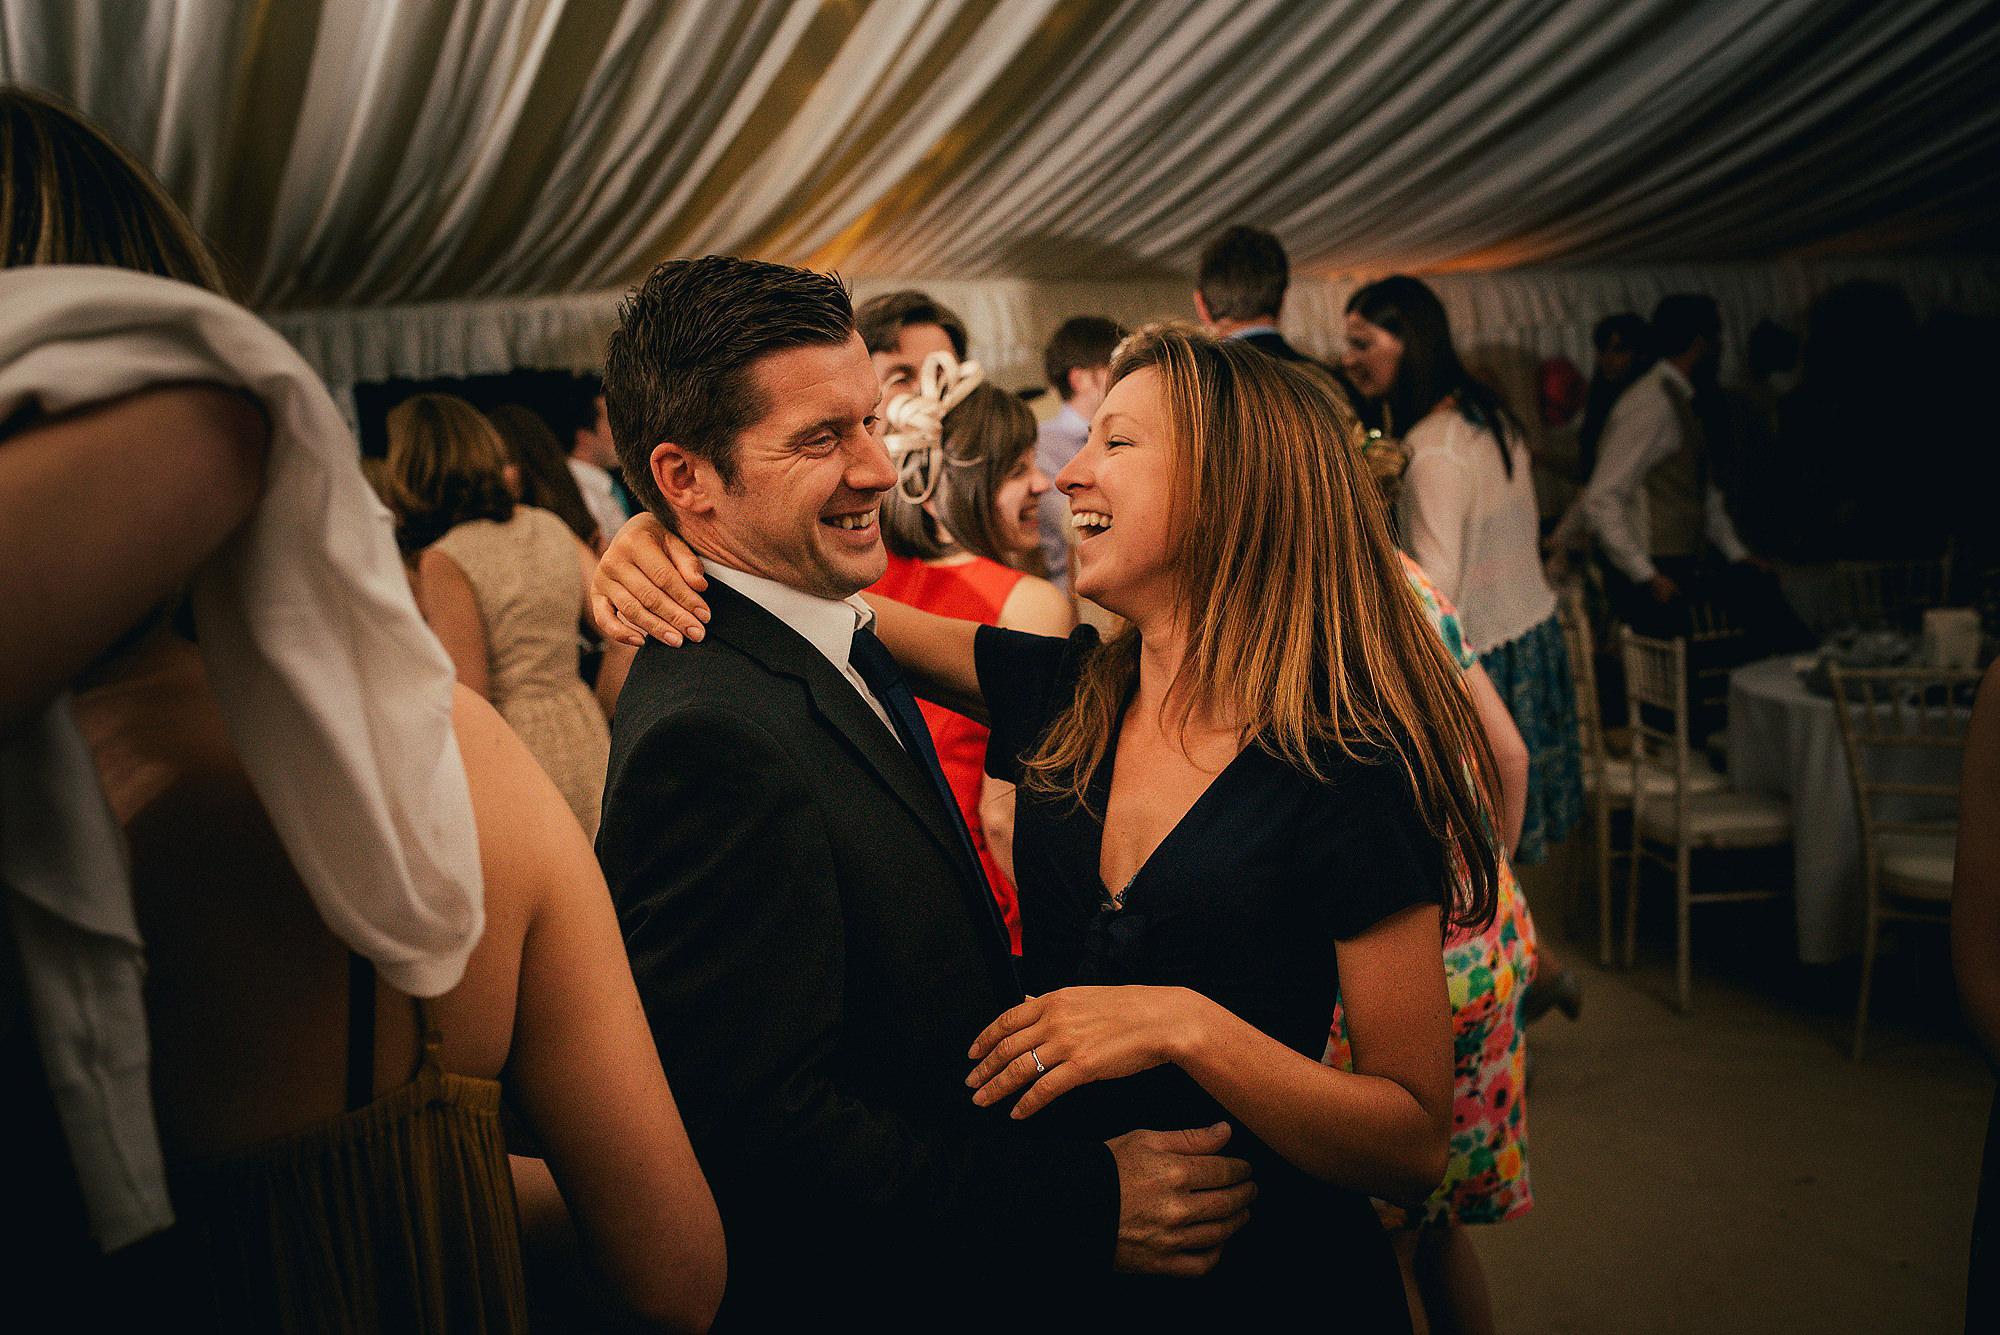 couple dancing at a wedding